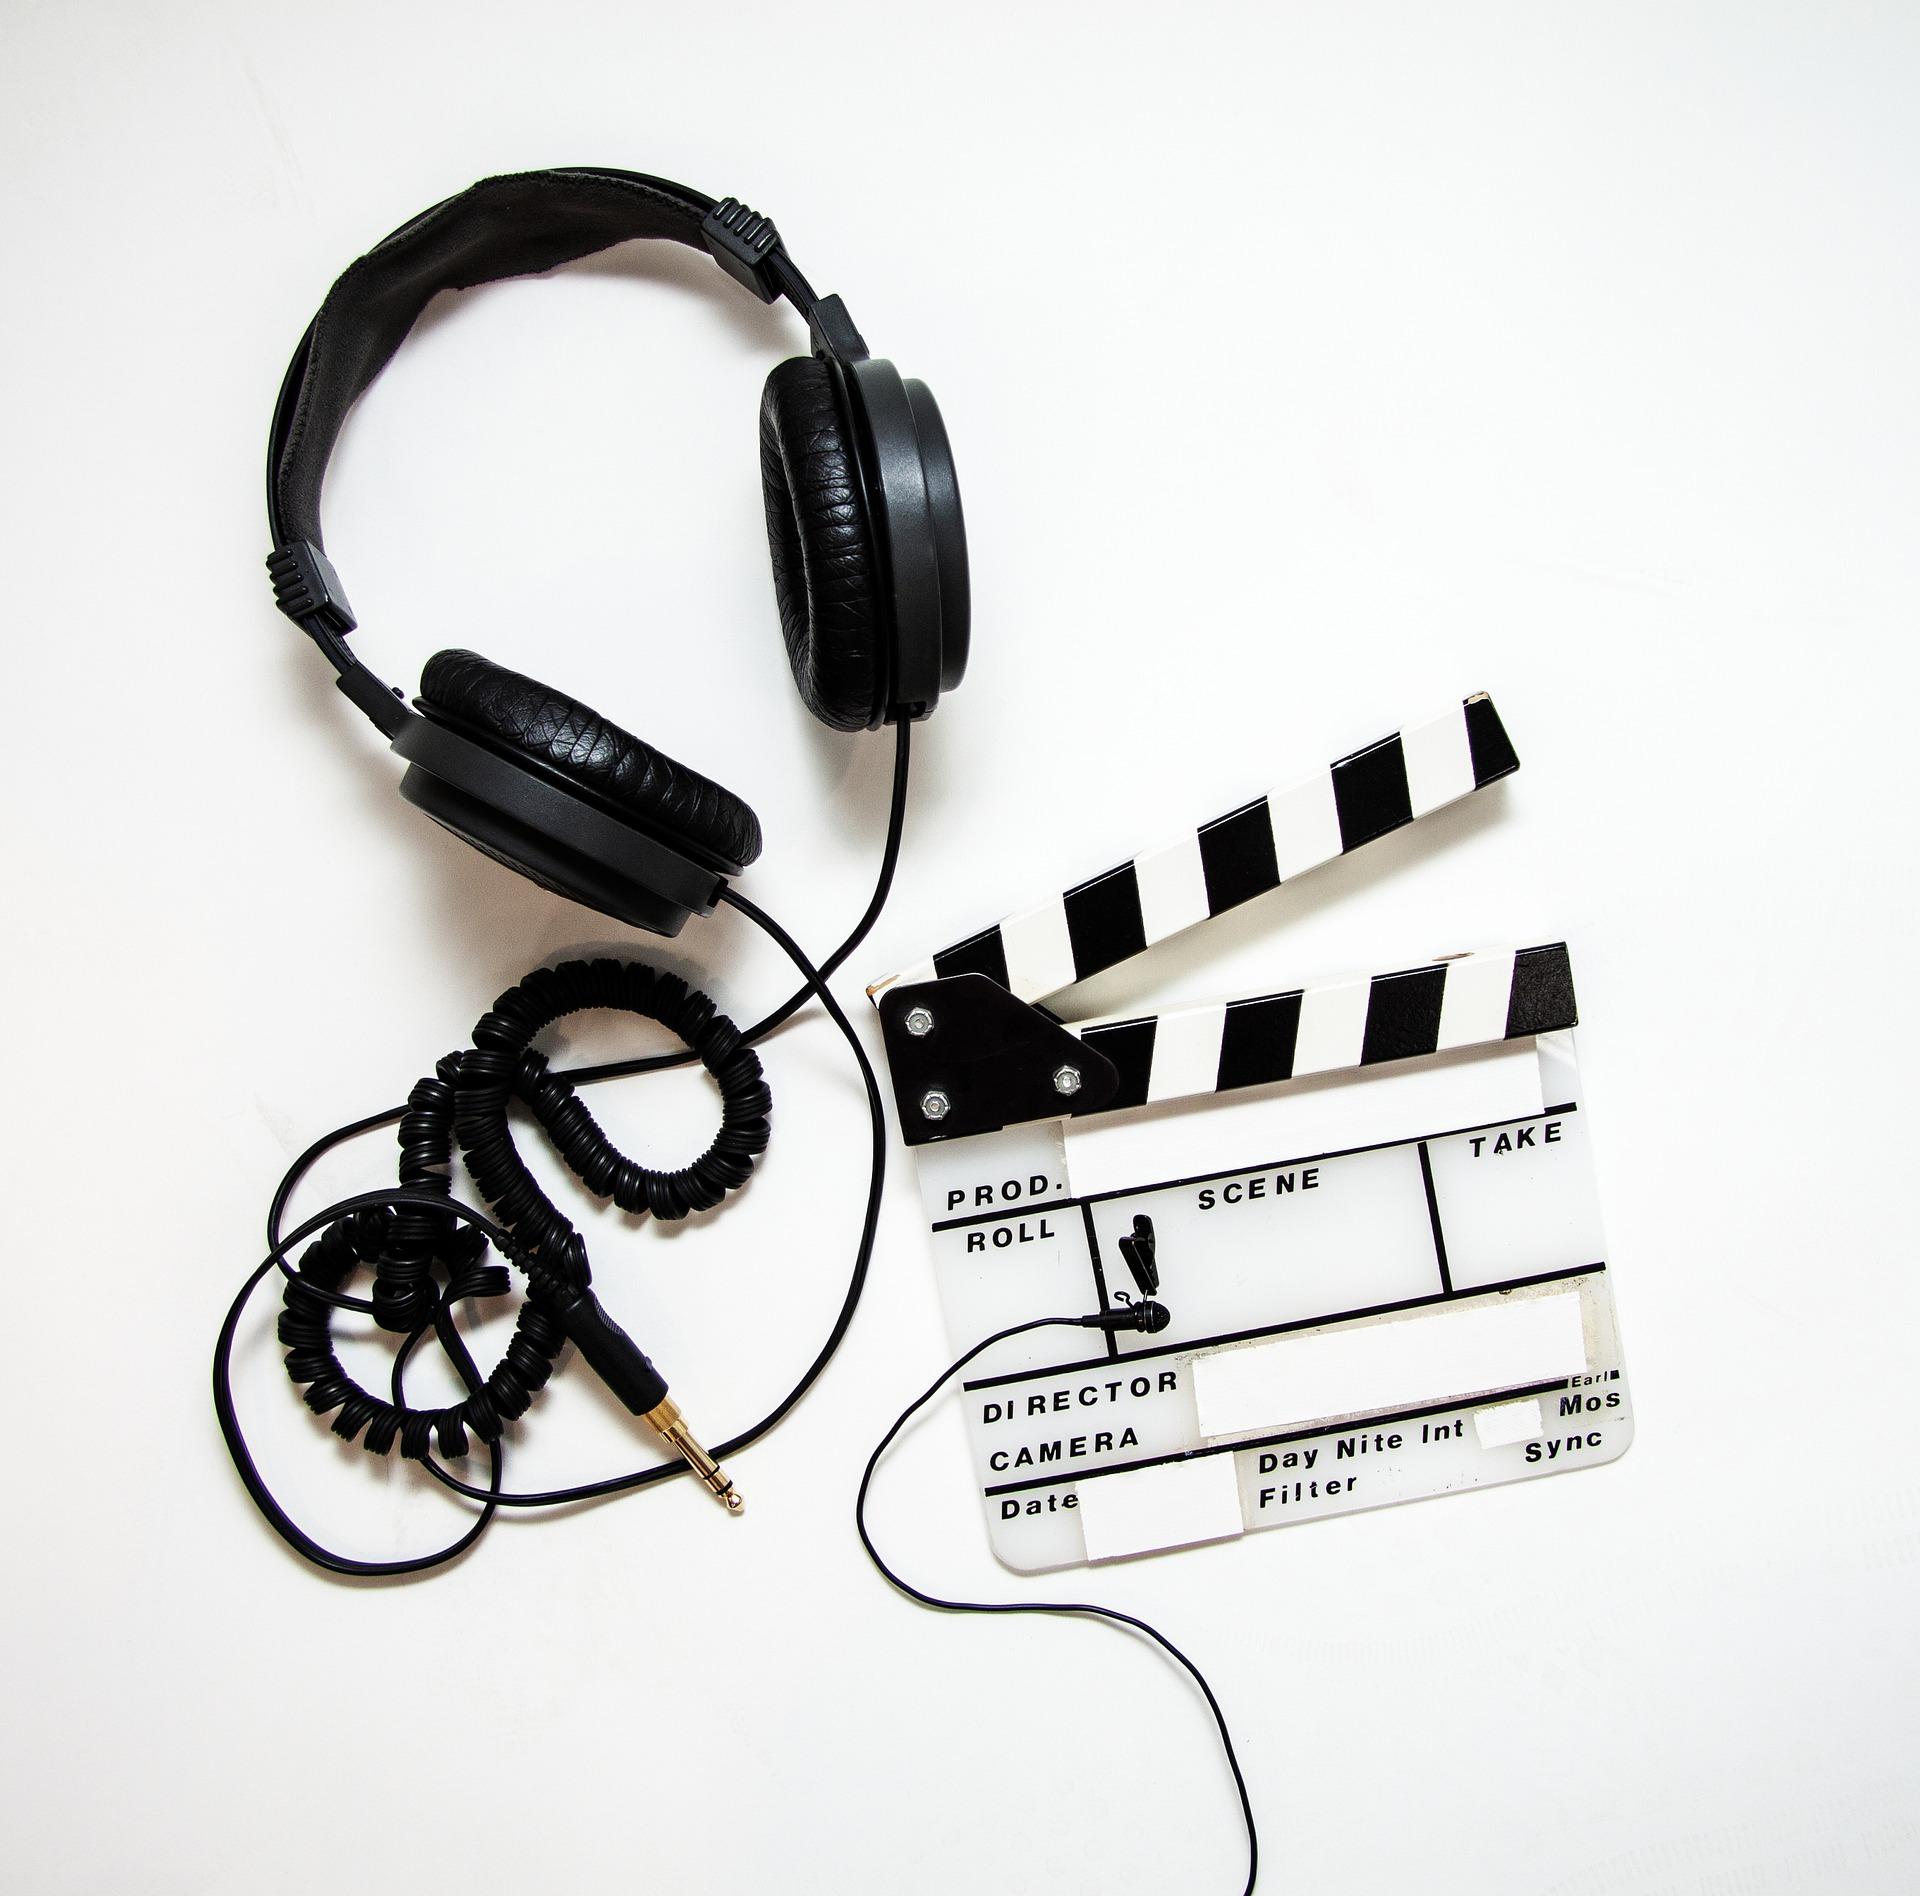 Kopfhörer und Klappe Camtasia